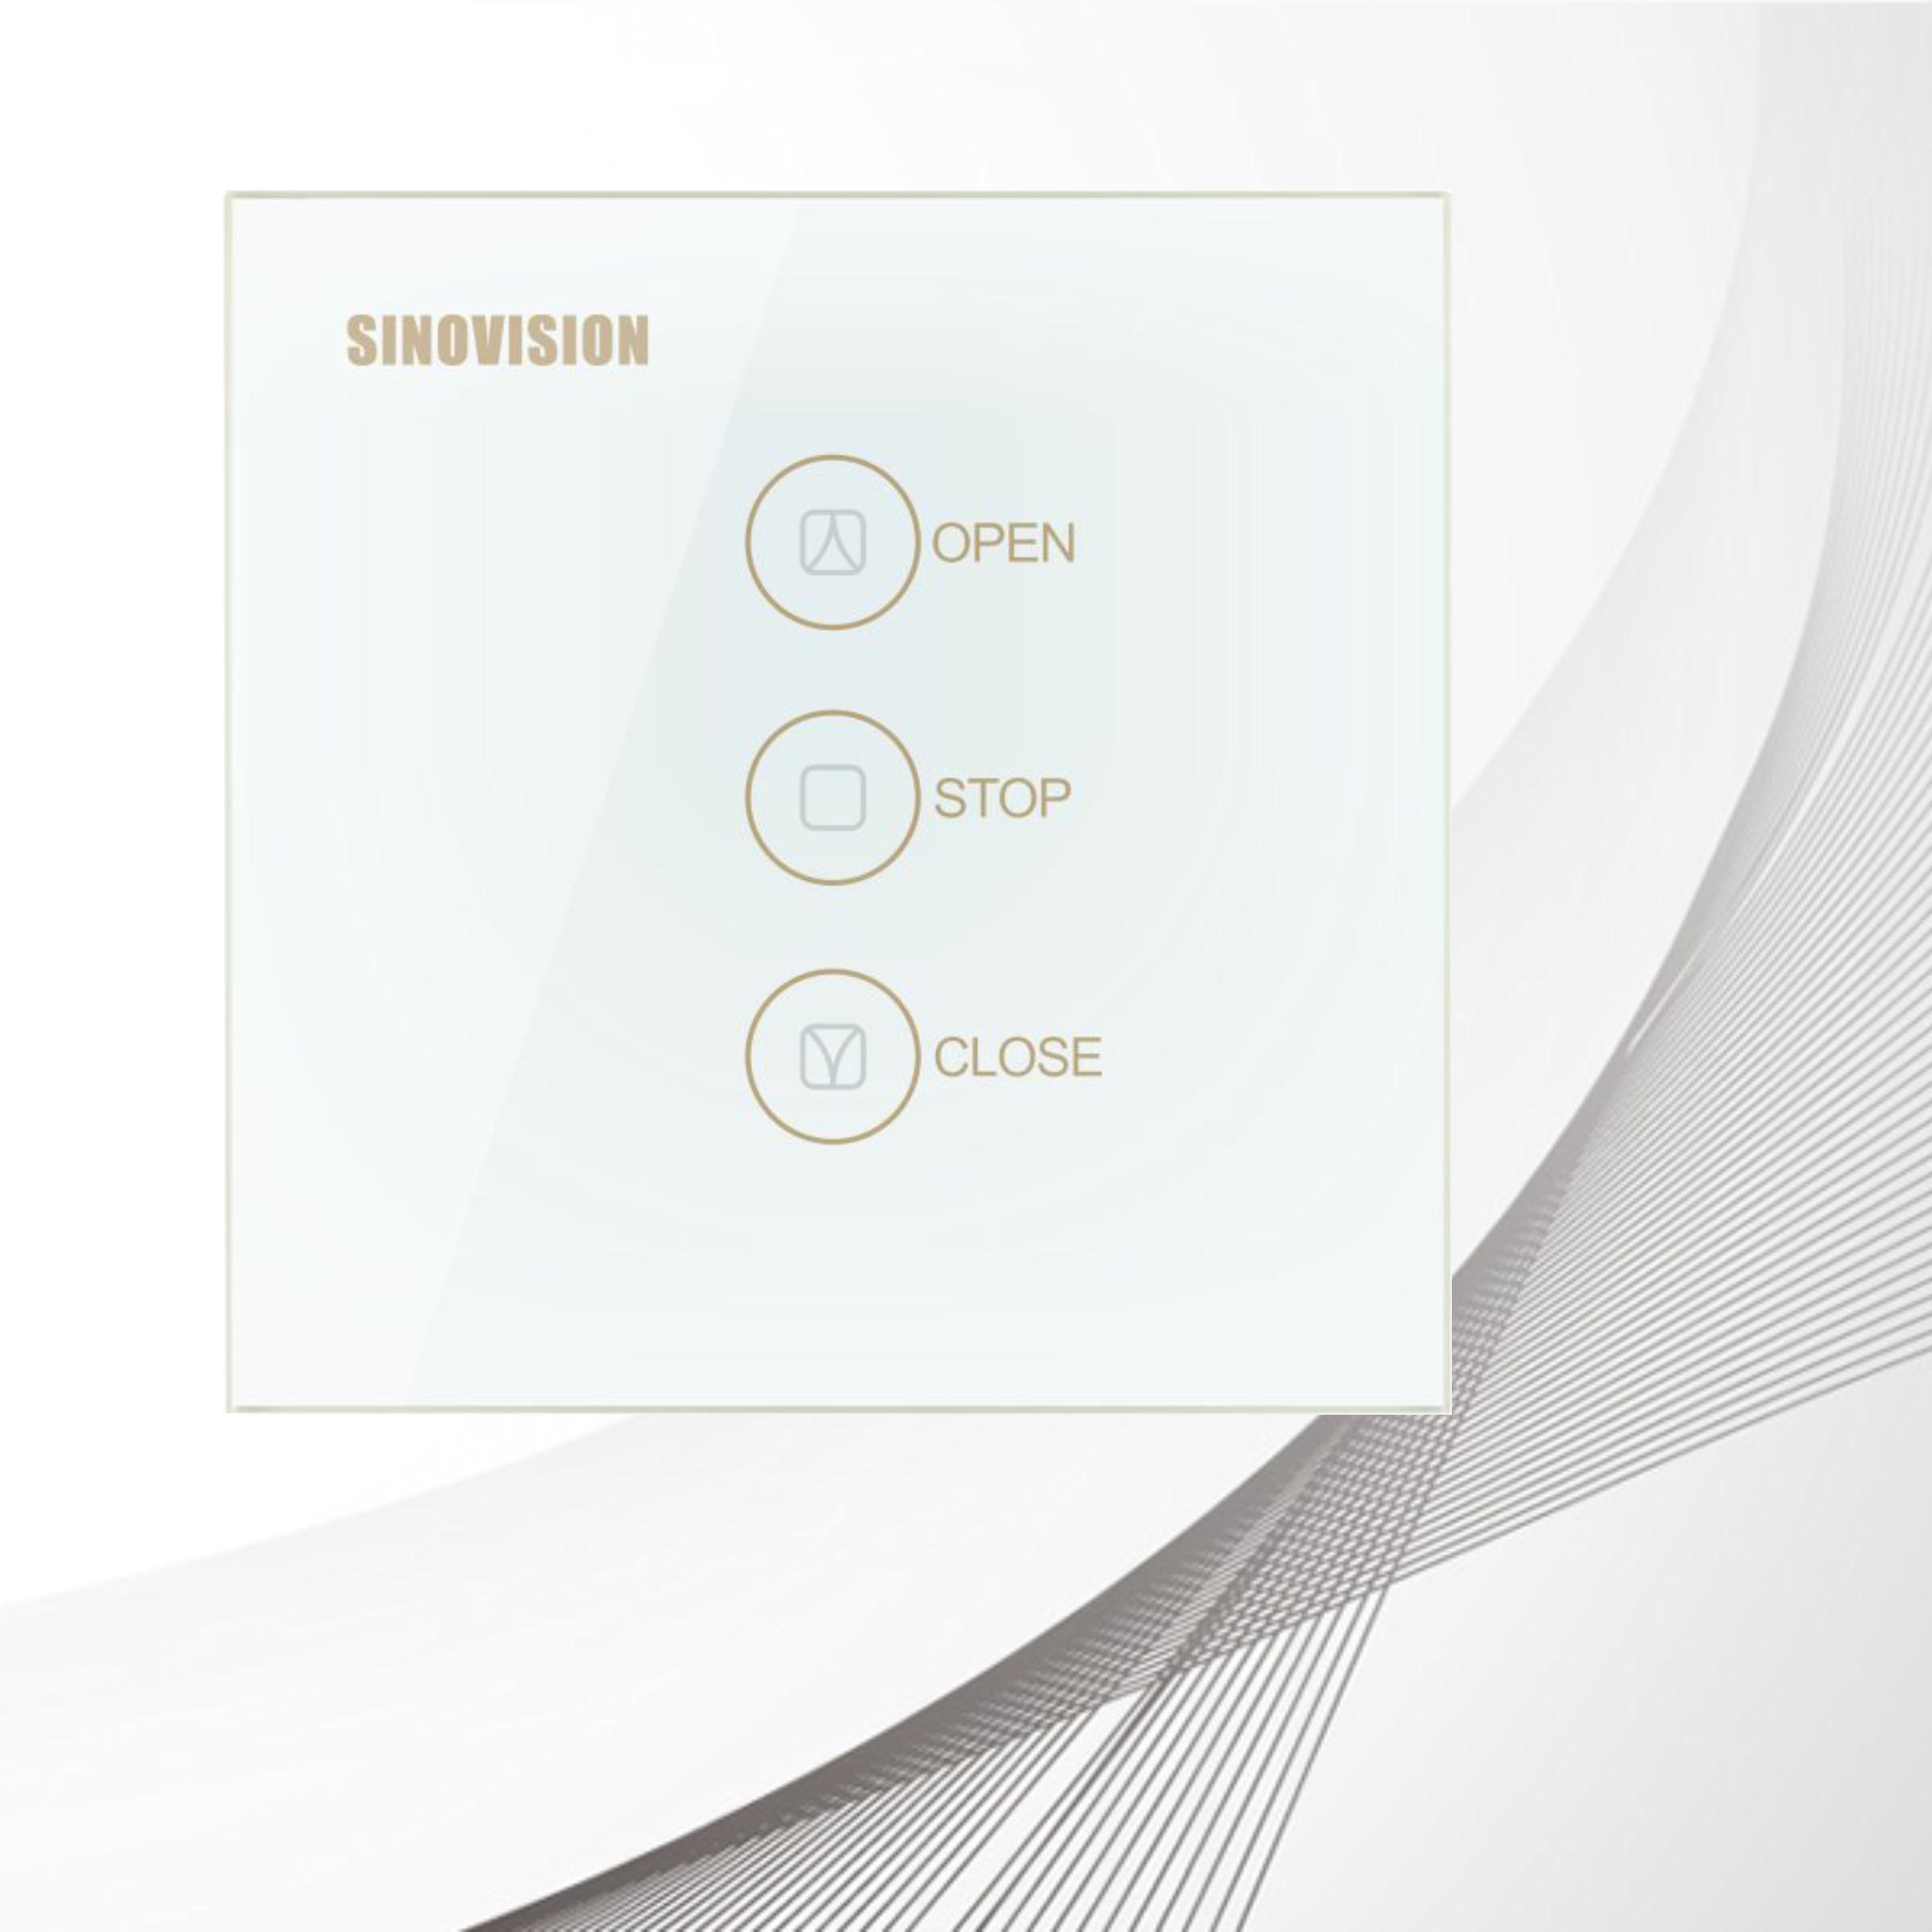 Sinovision Smart Curtain Controller